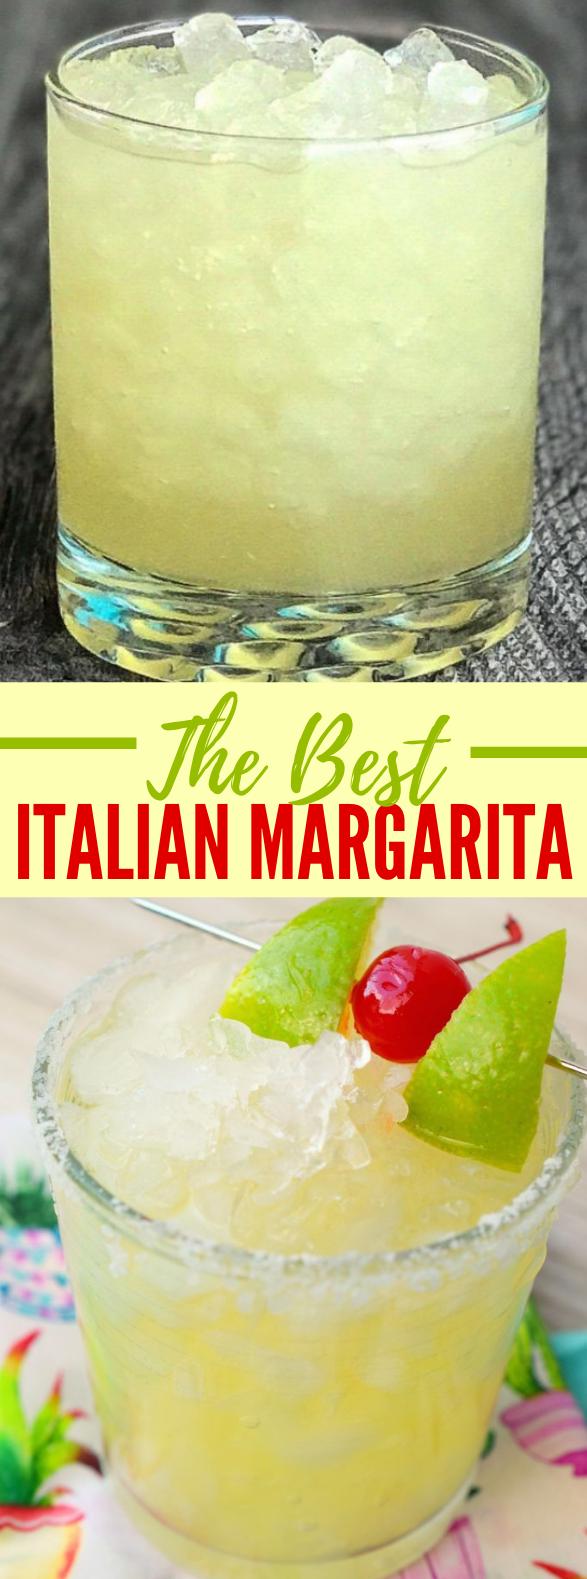 THE BEST ITALIAN MARGARITA YOU'VE EVER TASTED #drinks #classiccocktail